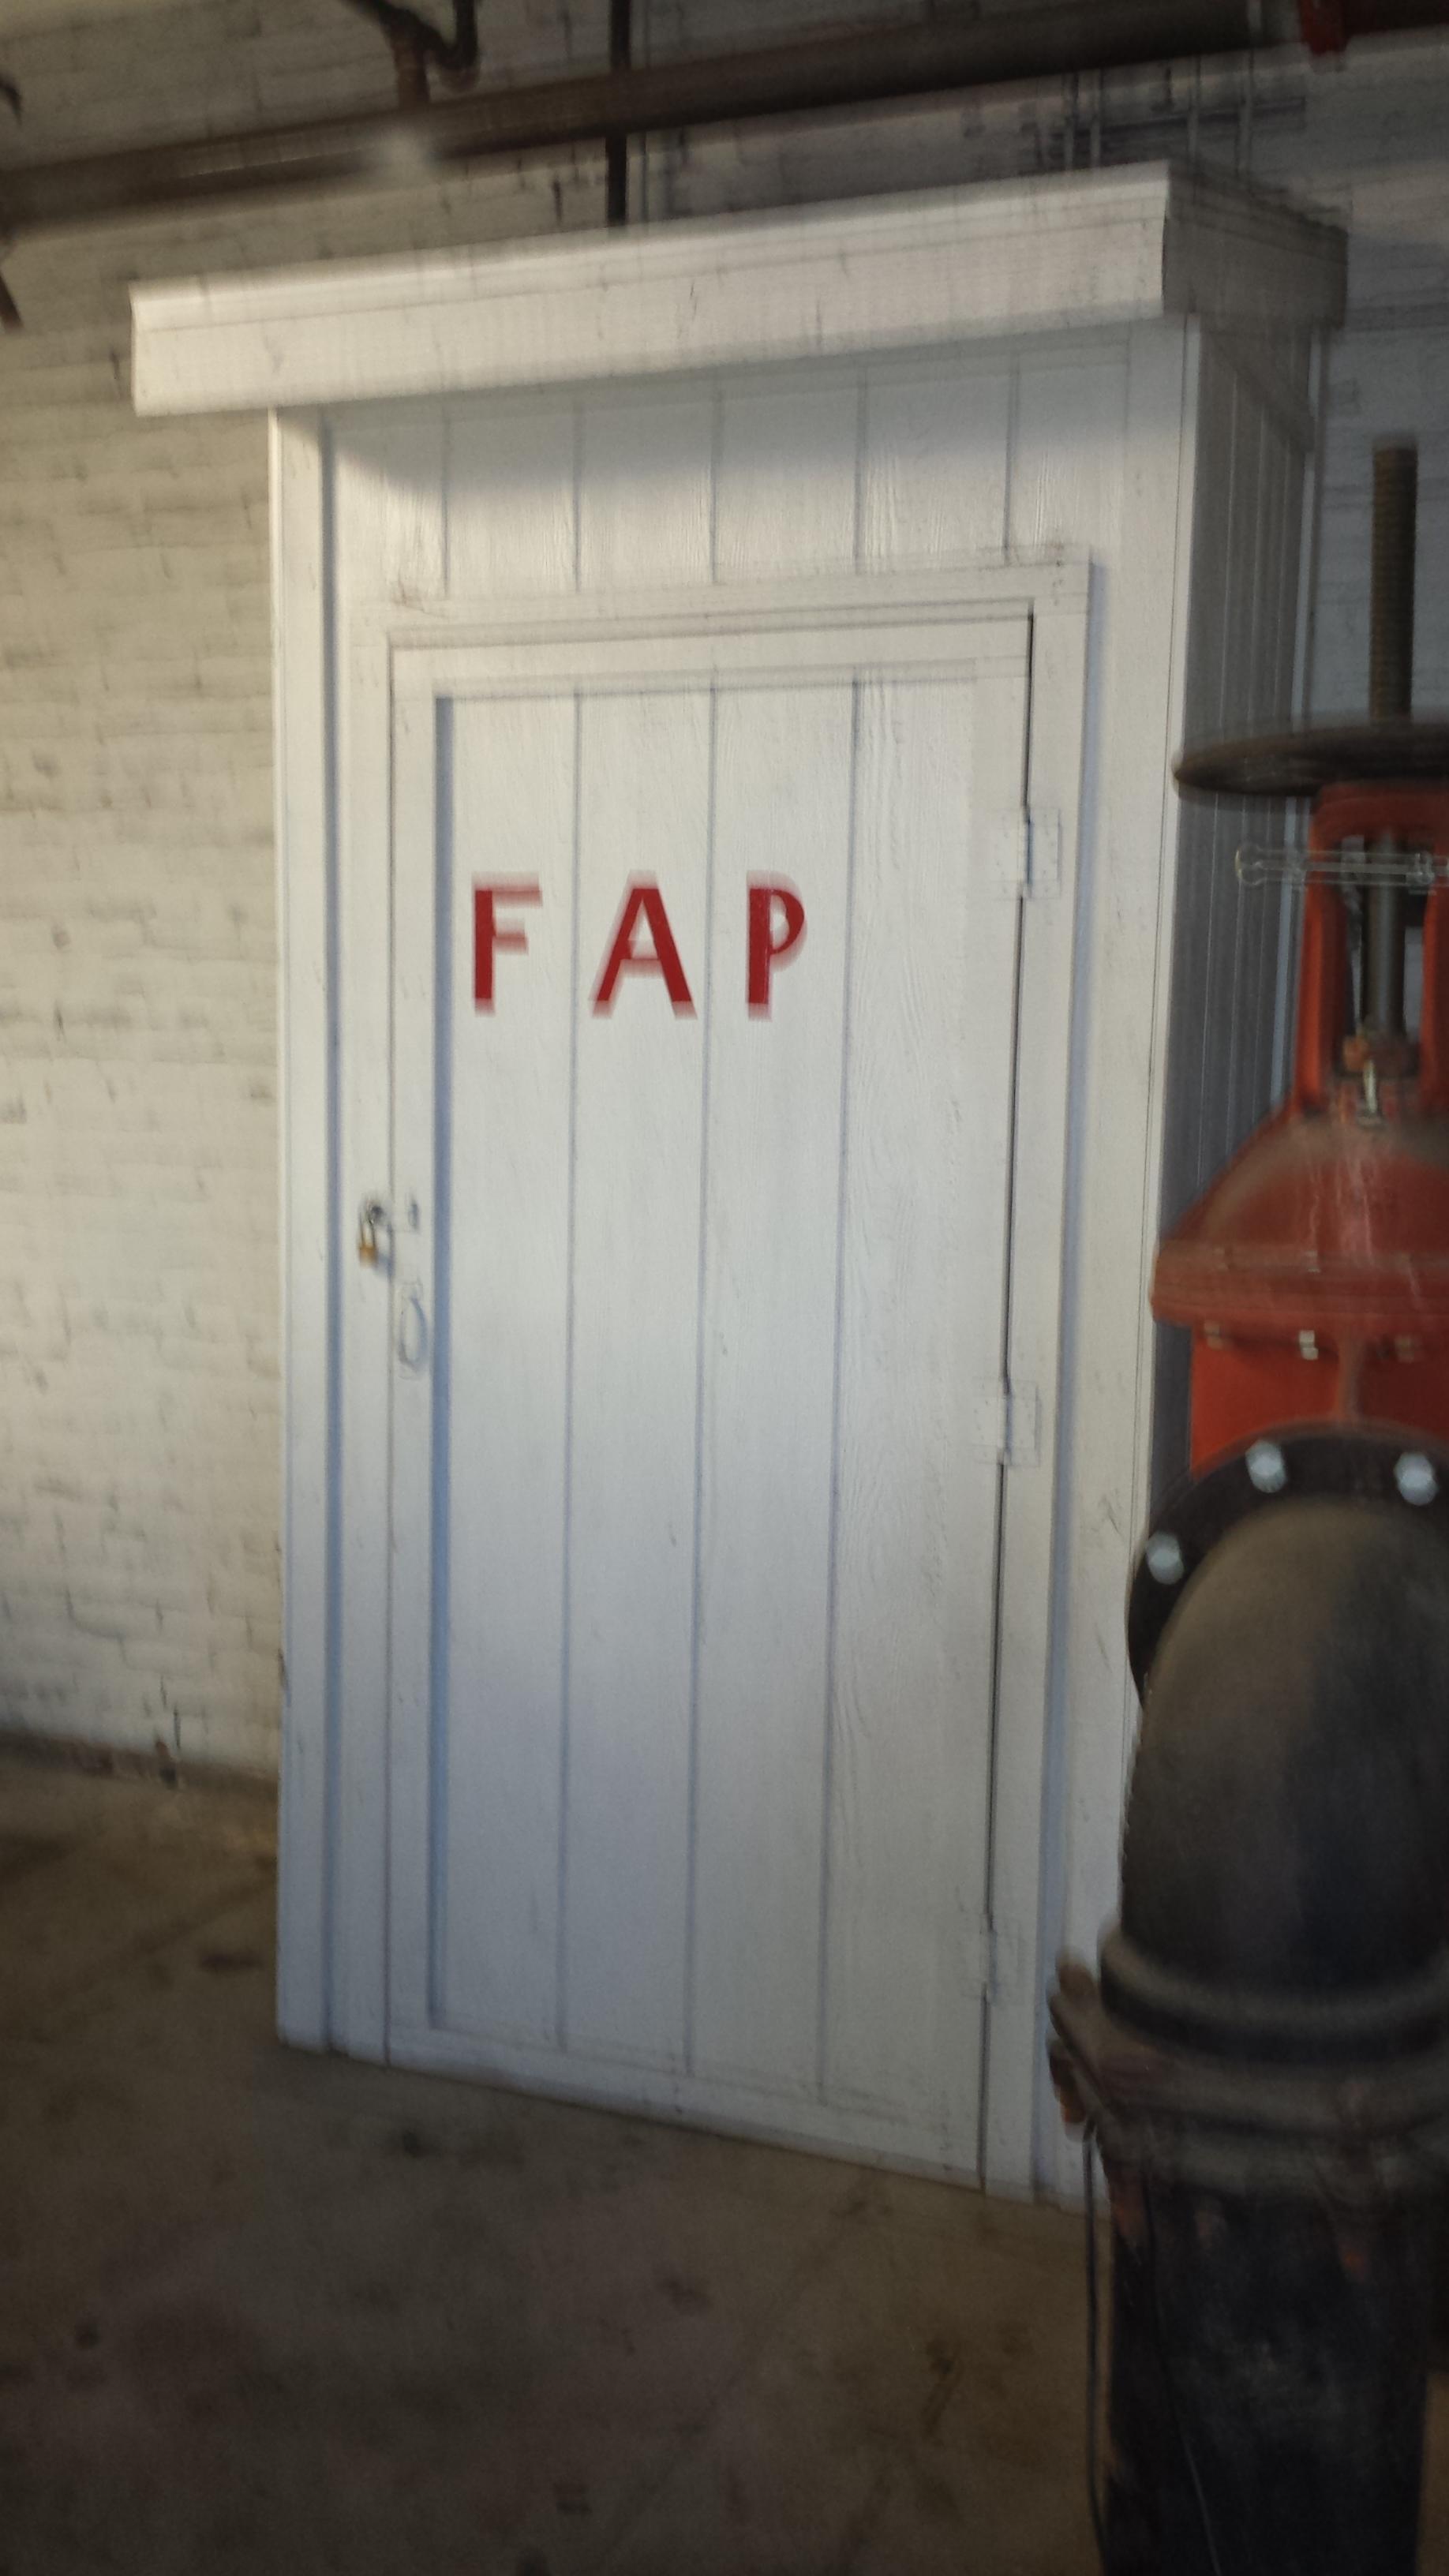 Fap room